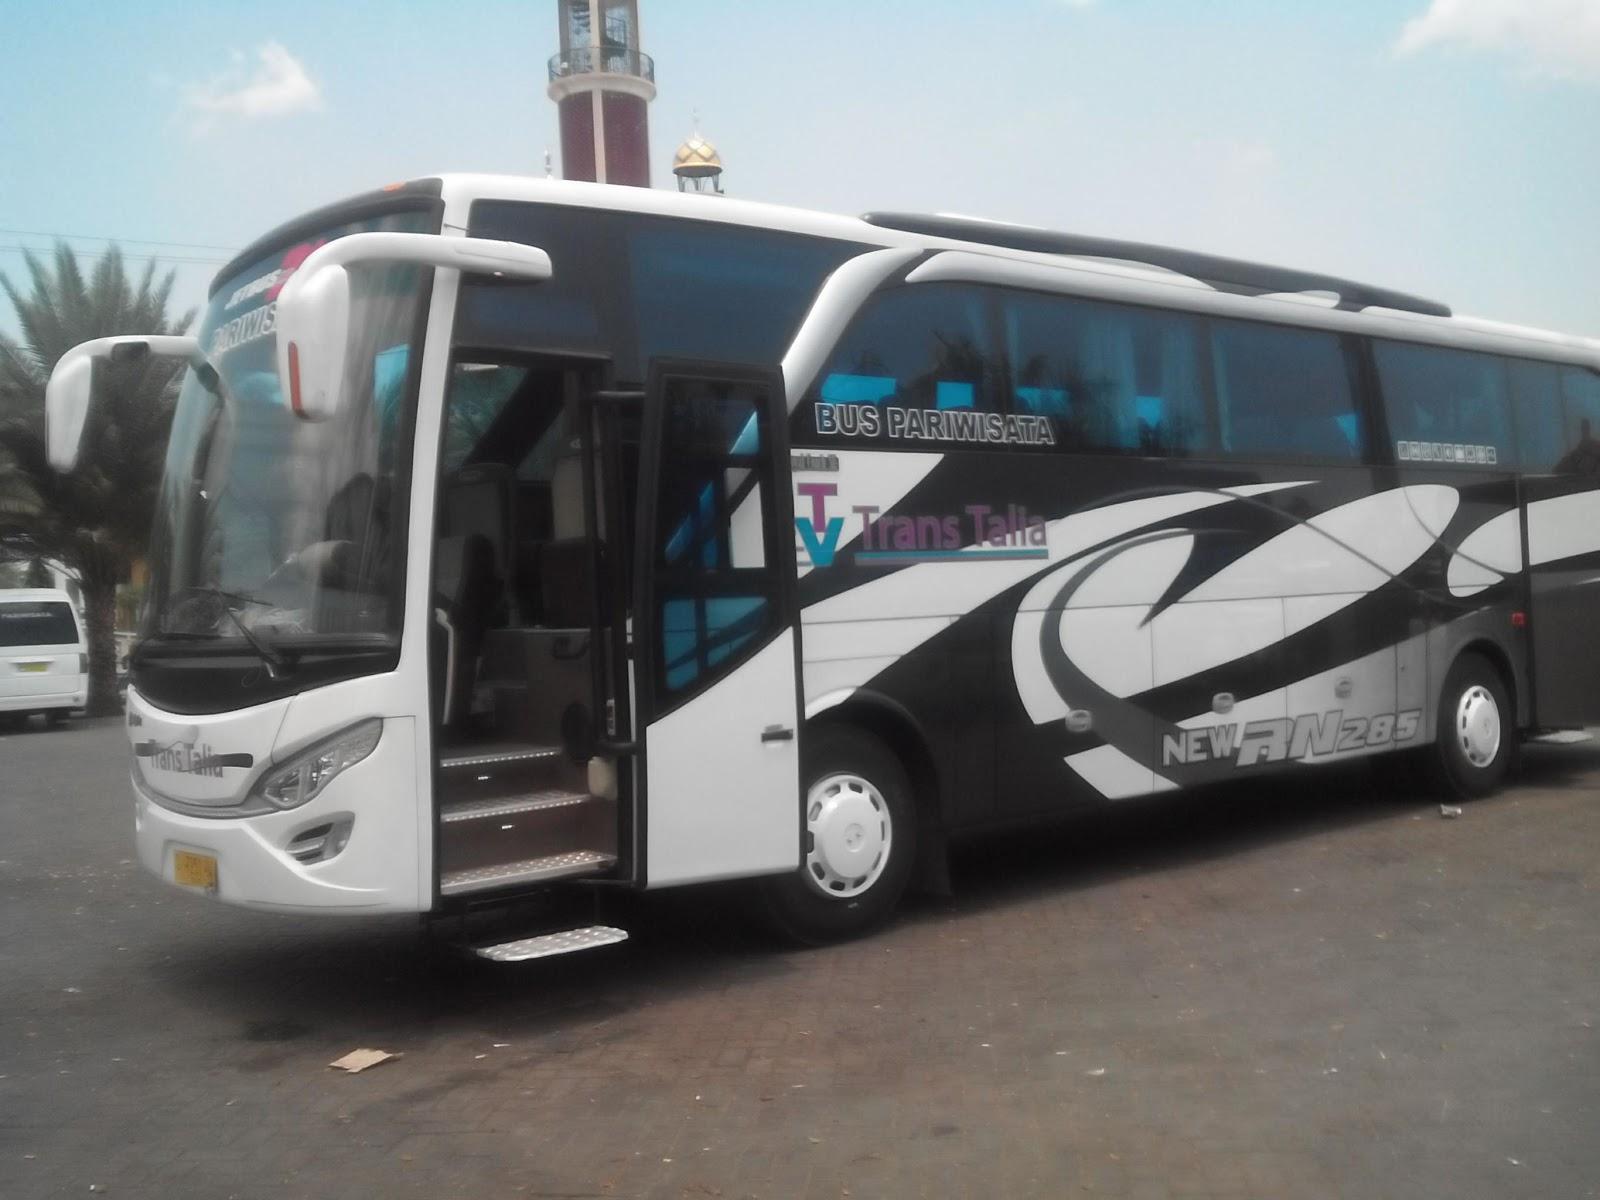 Bus Pariwisata Sebagai Transportasi Alternatif